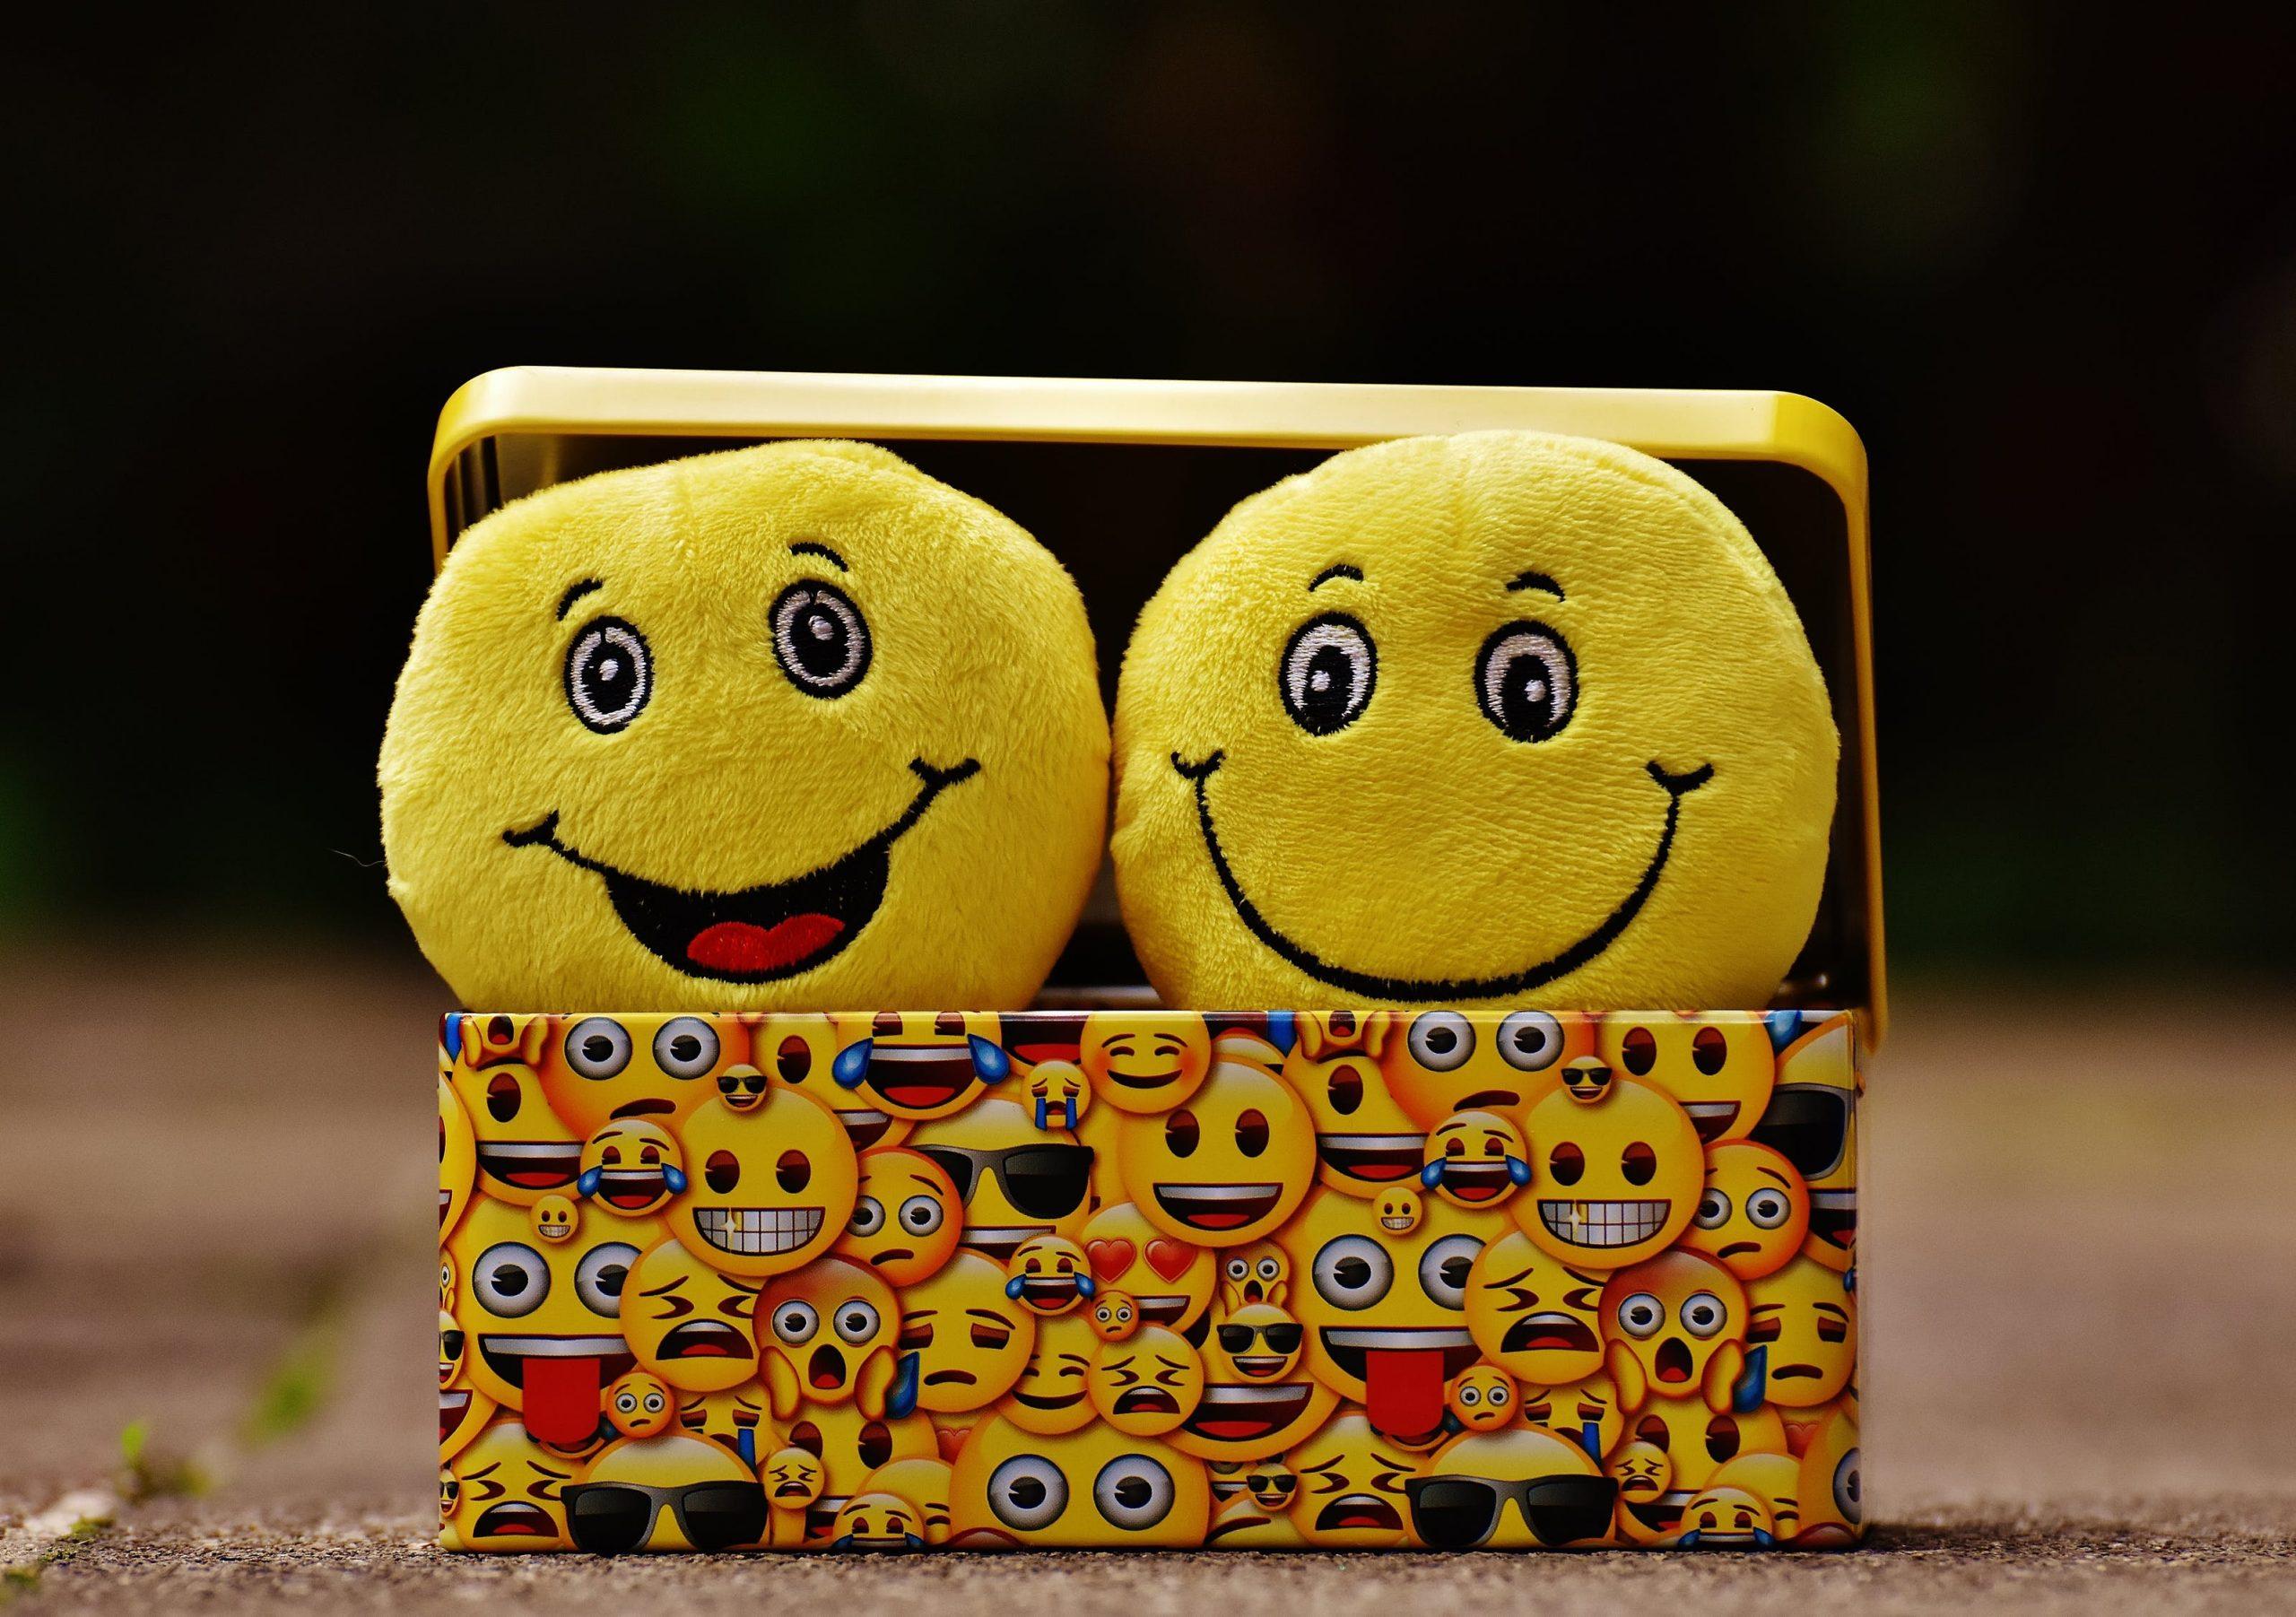 Using Emojis in Social Media Marketing